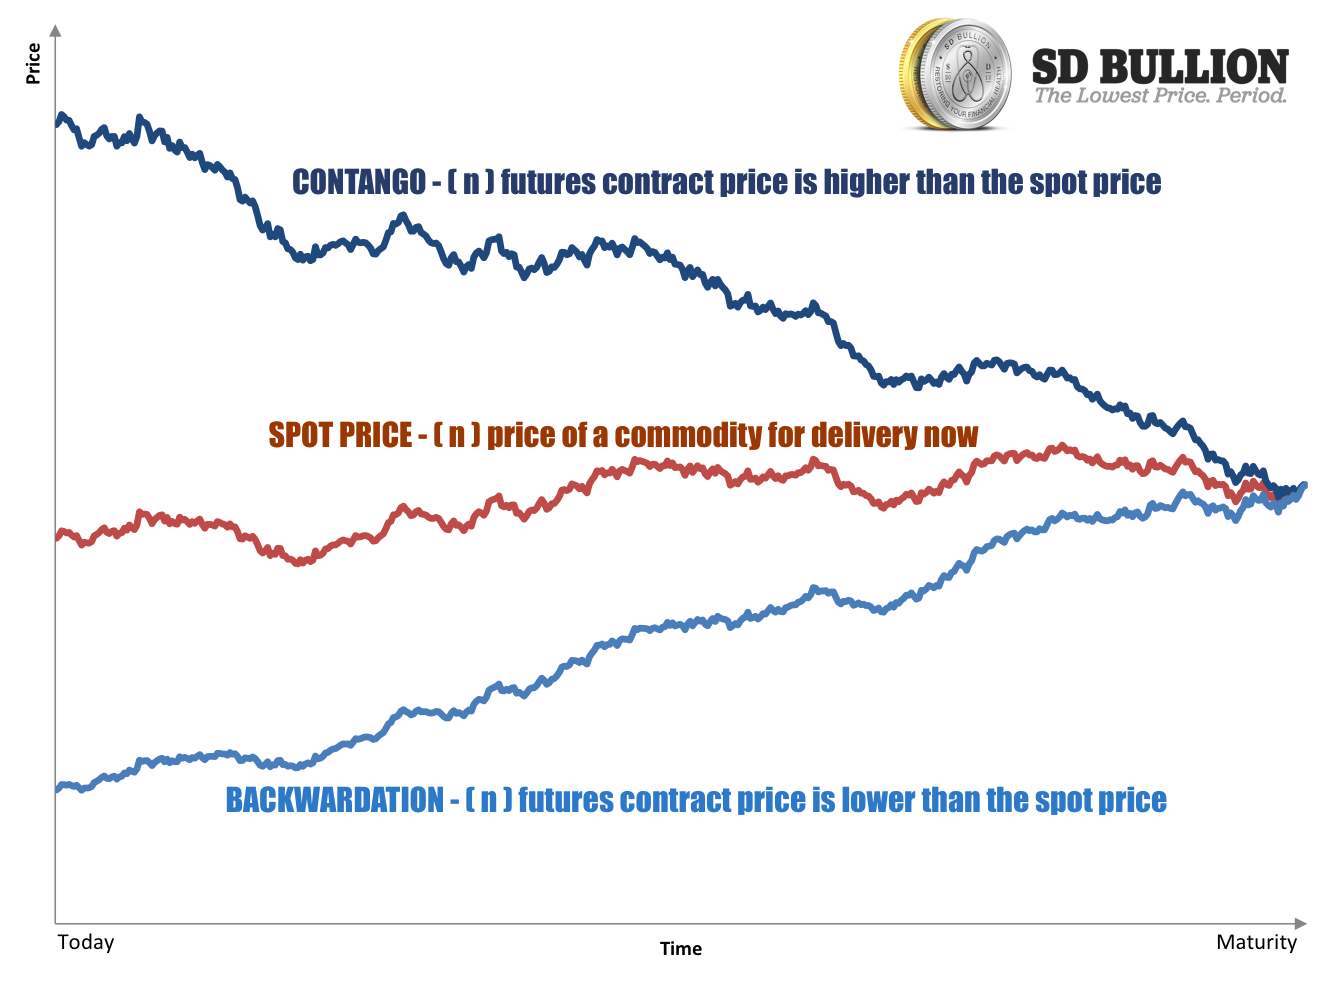 Backwardation Contango Futures Prices vs Spot Prices Gold Platinum Palladium Silver SD Bullion SDBullion.com